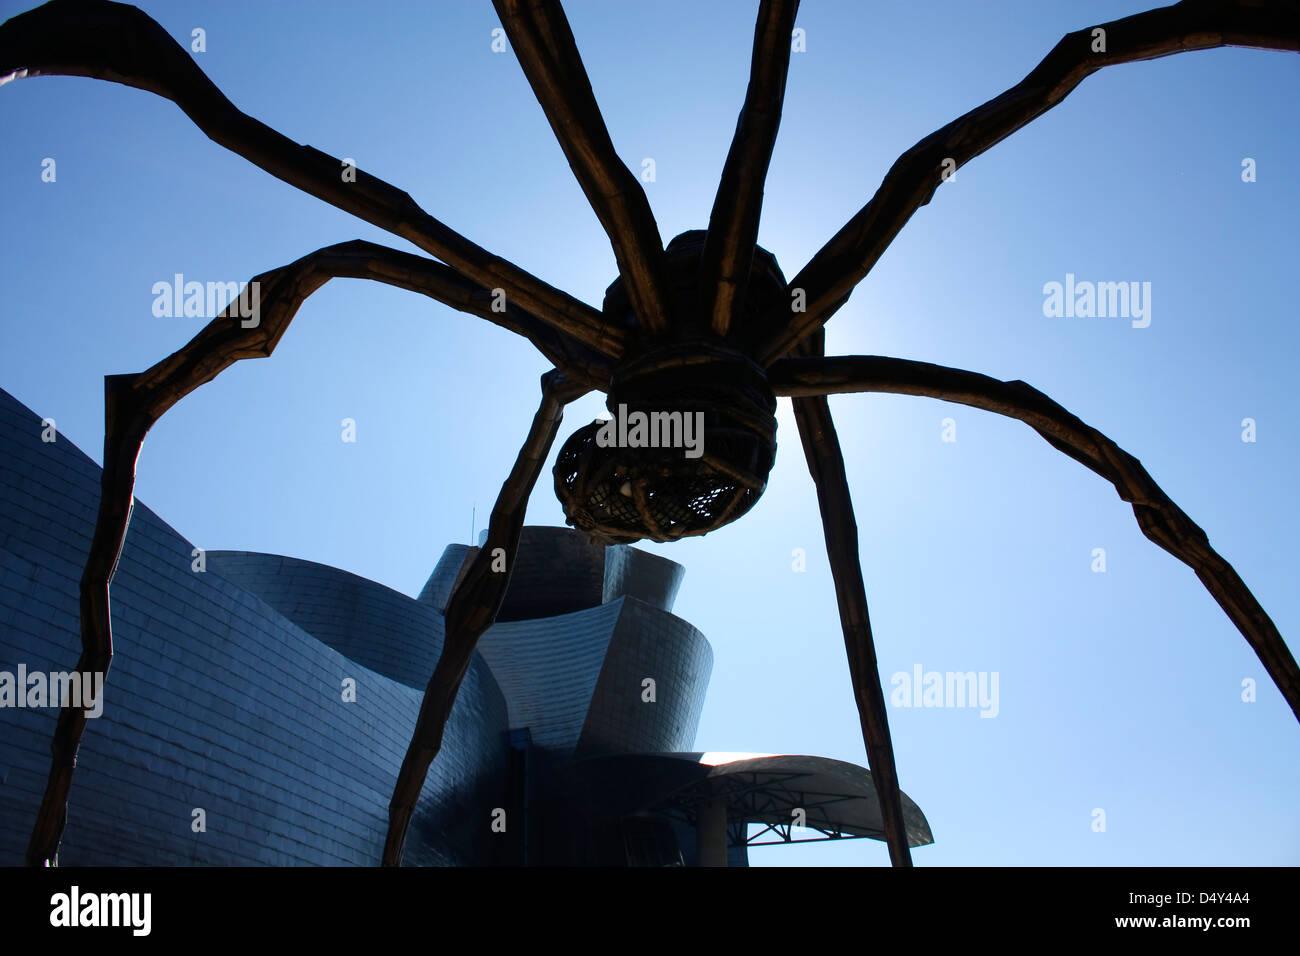 The giant spider 'Mama', the artist Louise Bourgeois. the Guggenheim Museum, Bilbao, Euskadi, Spain - Stock Image